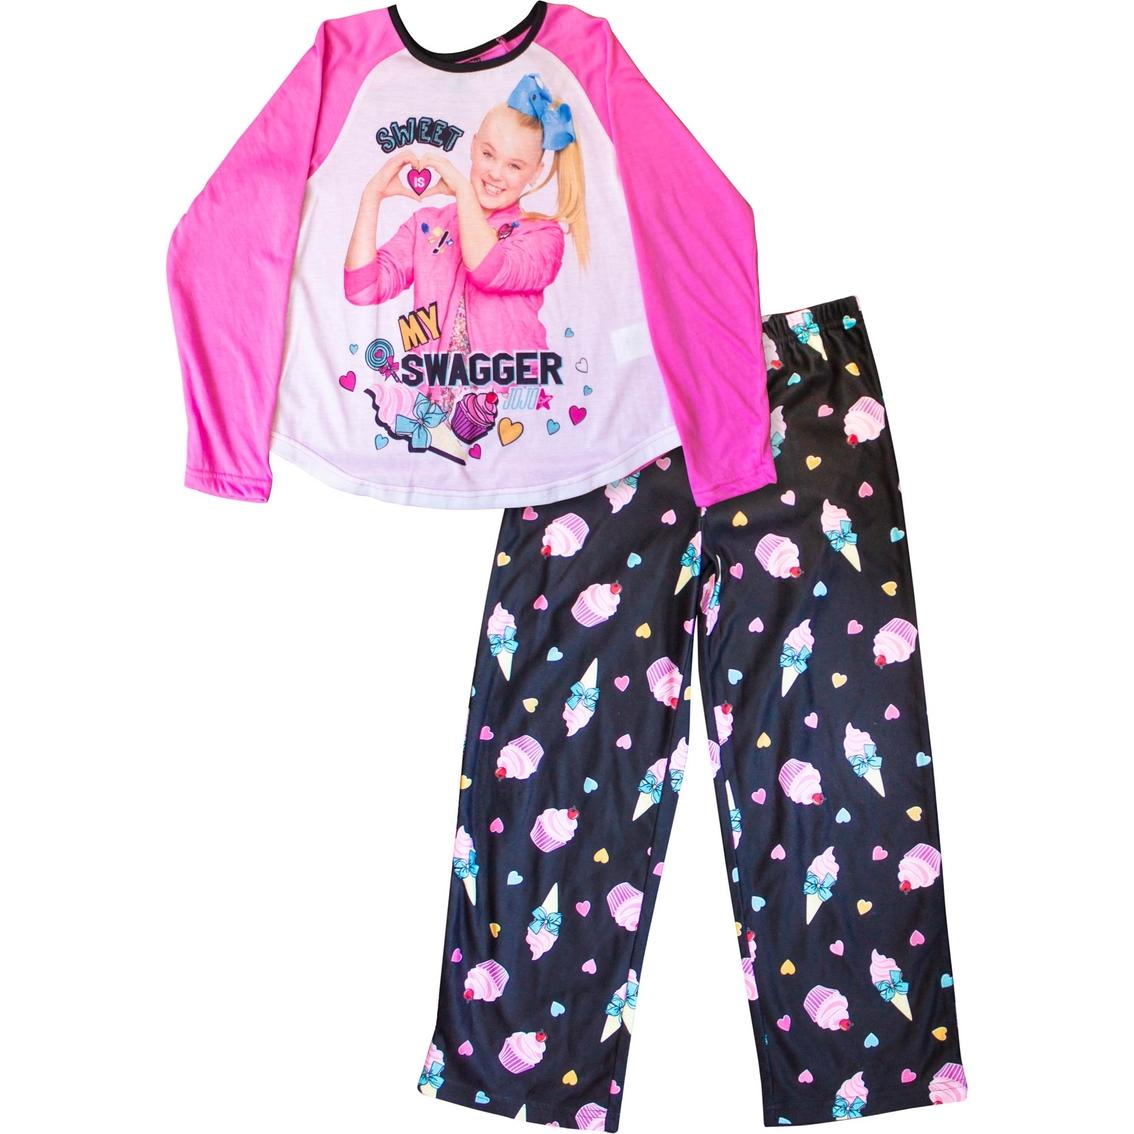 627e1372a Jojo Girls Sweet Is My Swagger 2 Pc. Pajama Set